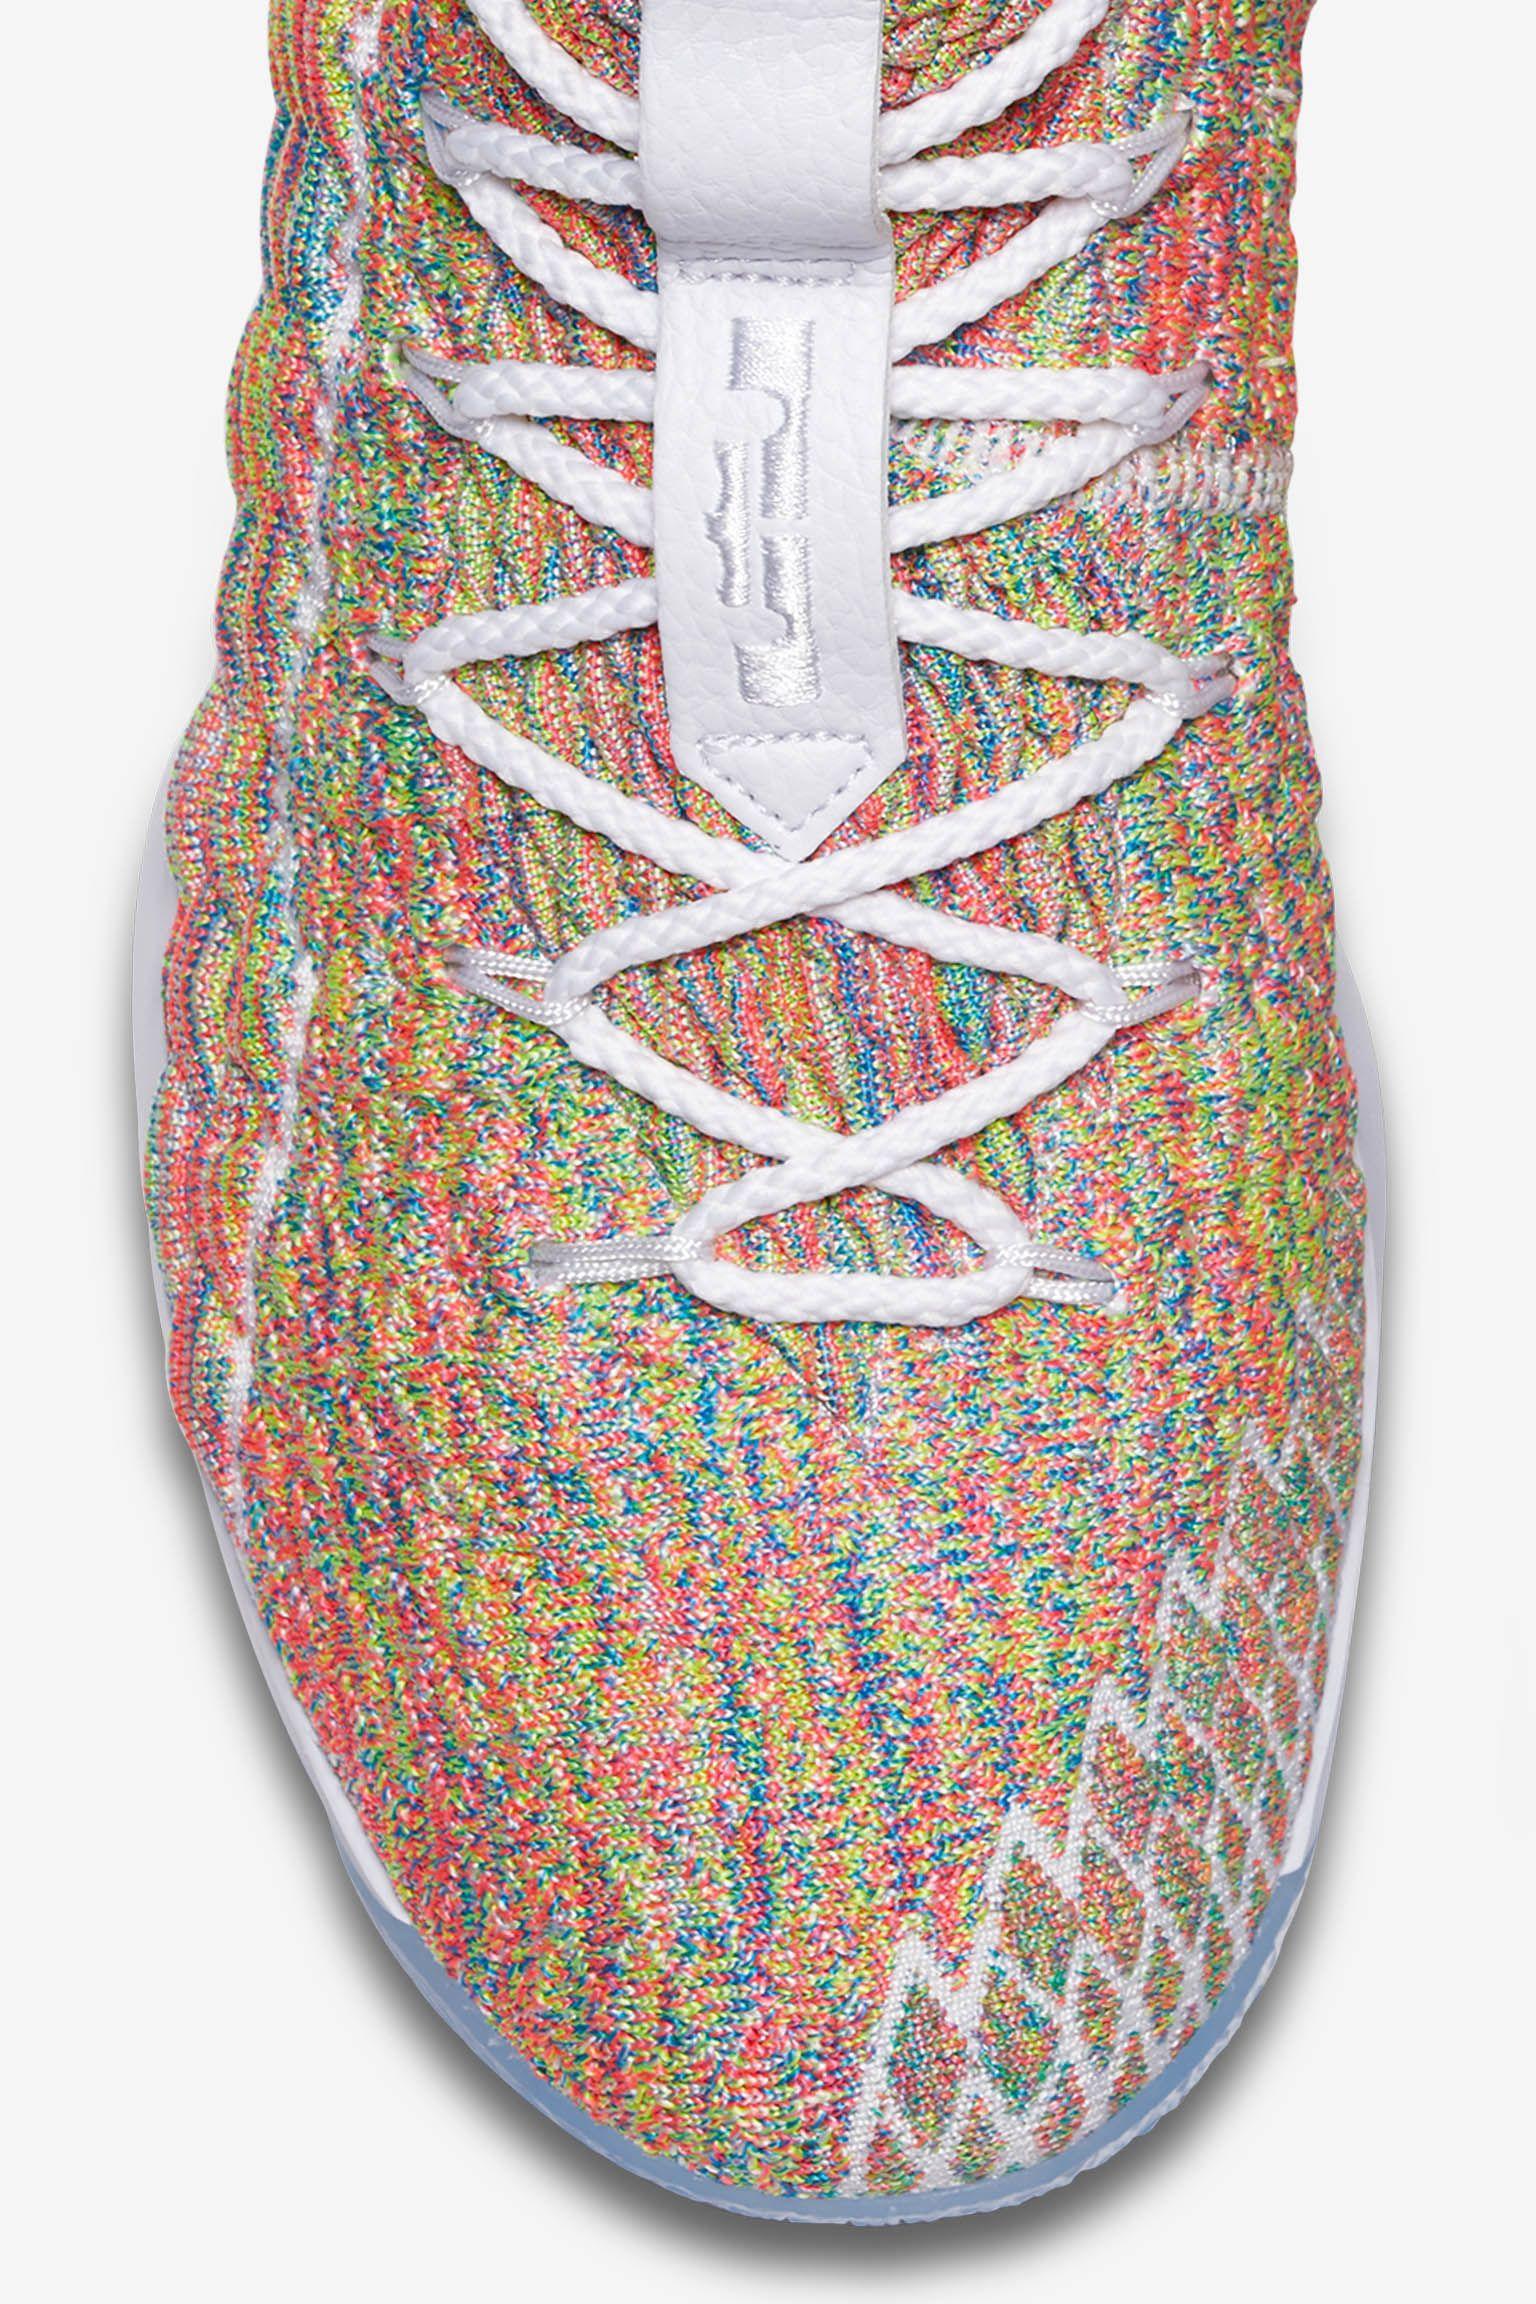 73588917e6c22b Nike LeBron 15  White  amp  Multicolour  Release Date. Nike+ Launch FI